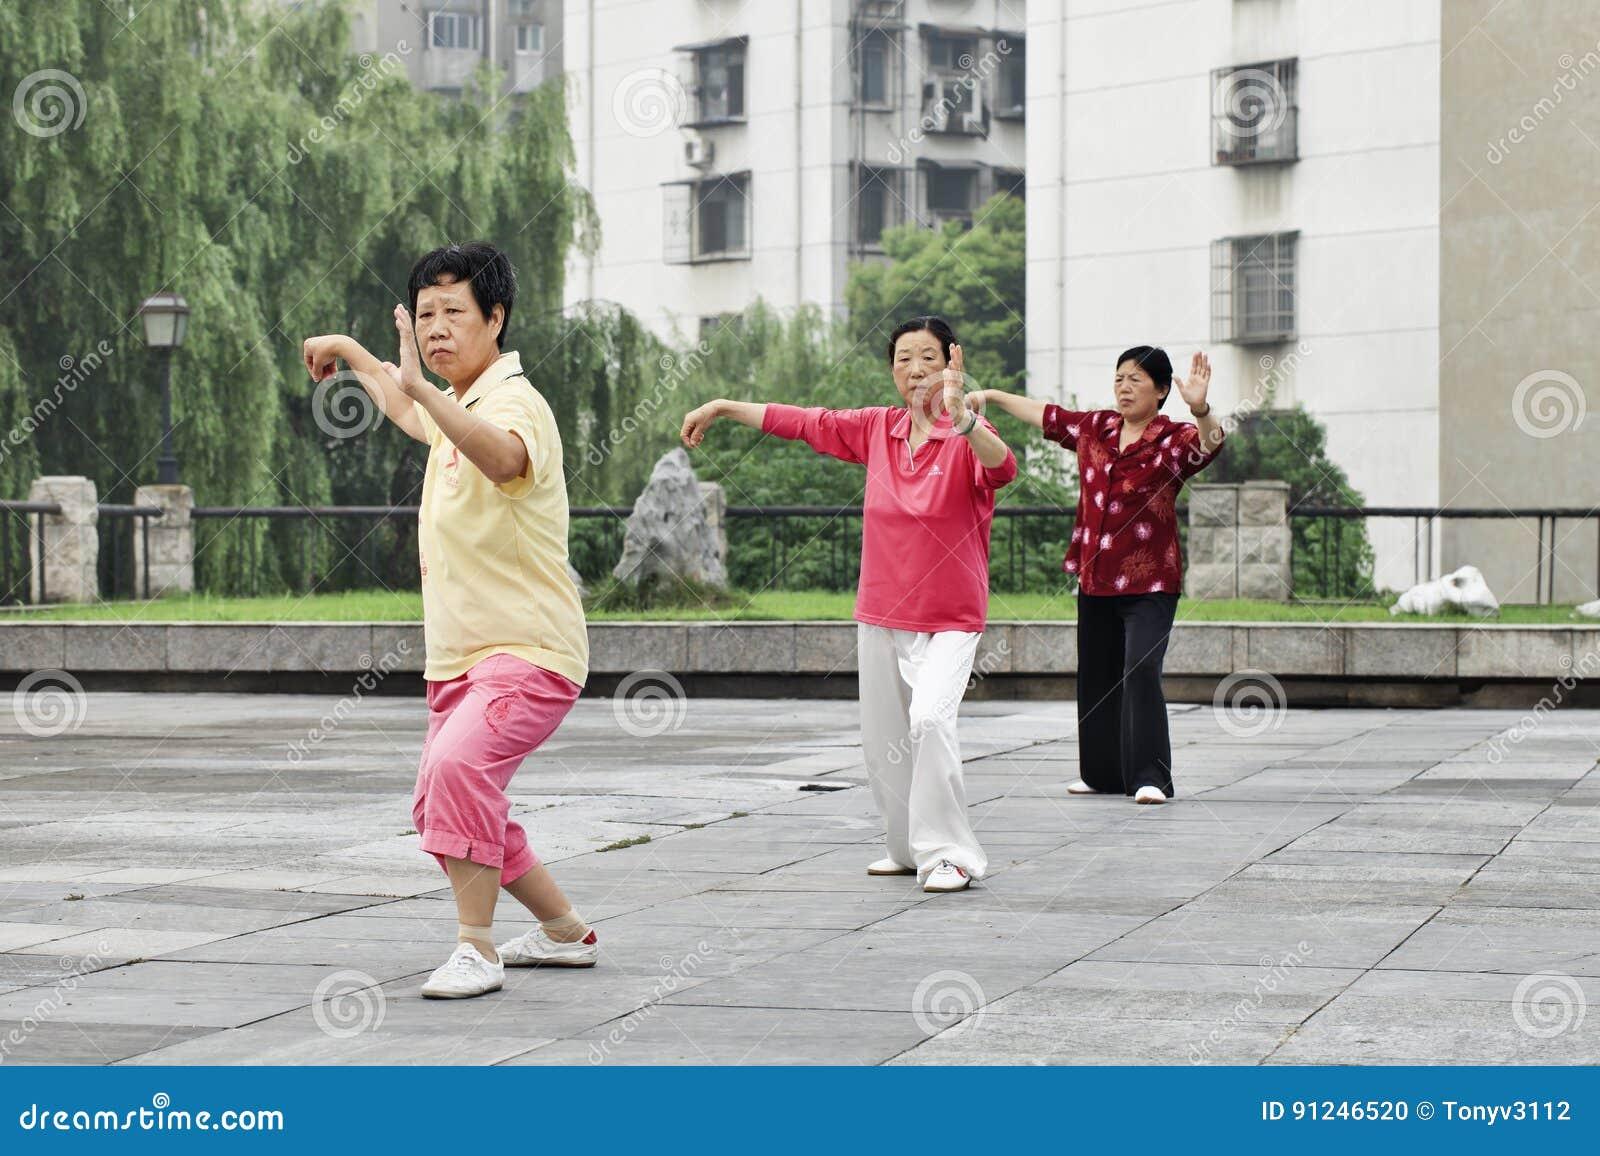 Female seniors practicing Tai Chi in the early morning, Xiang Yang, China